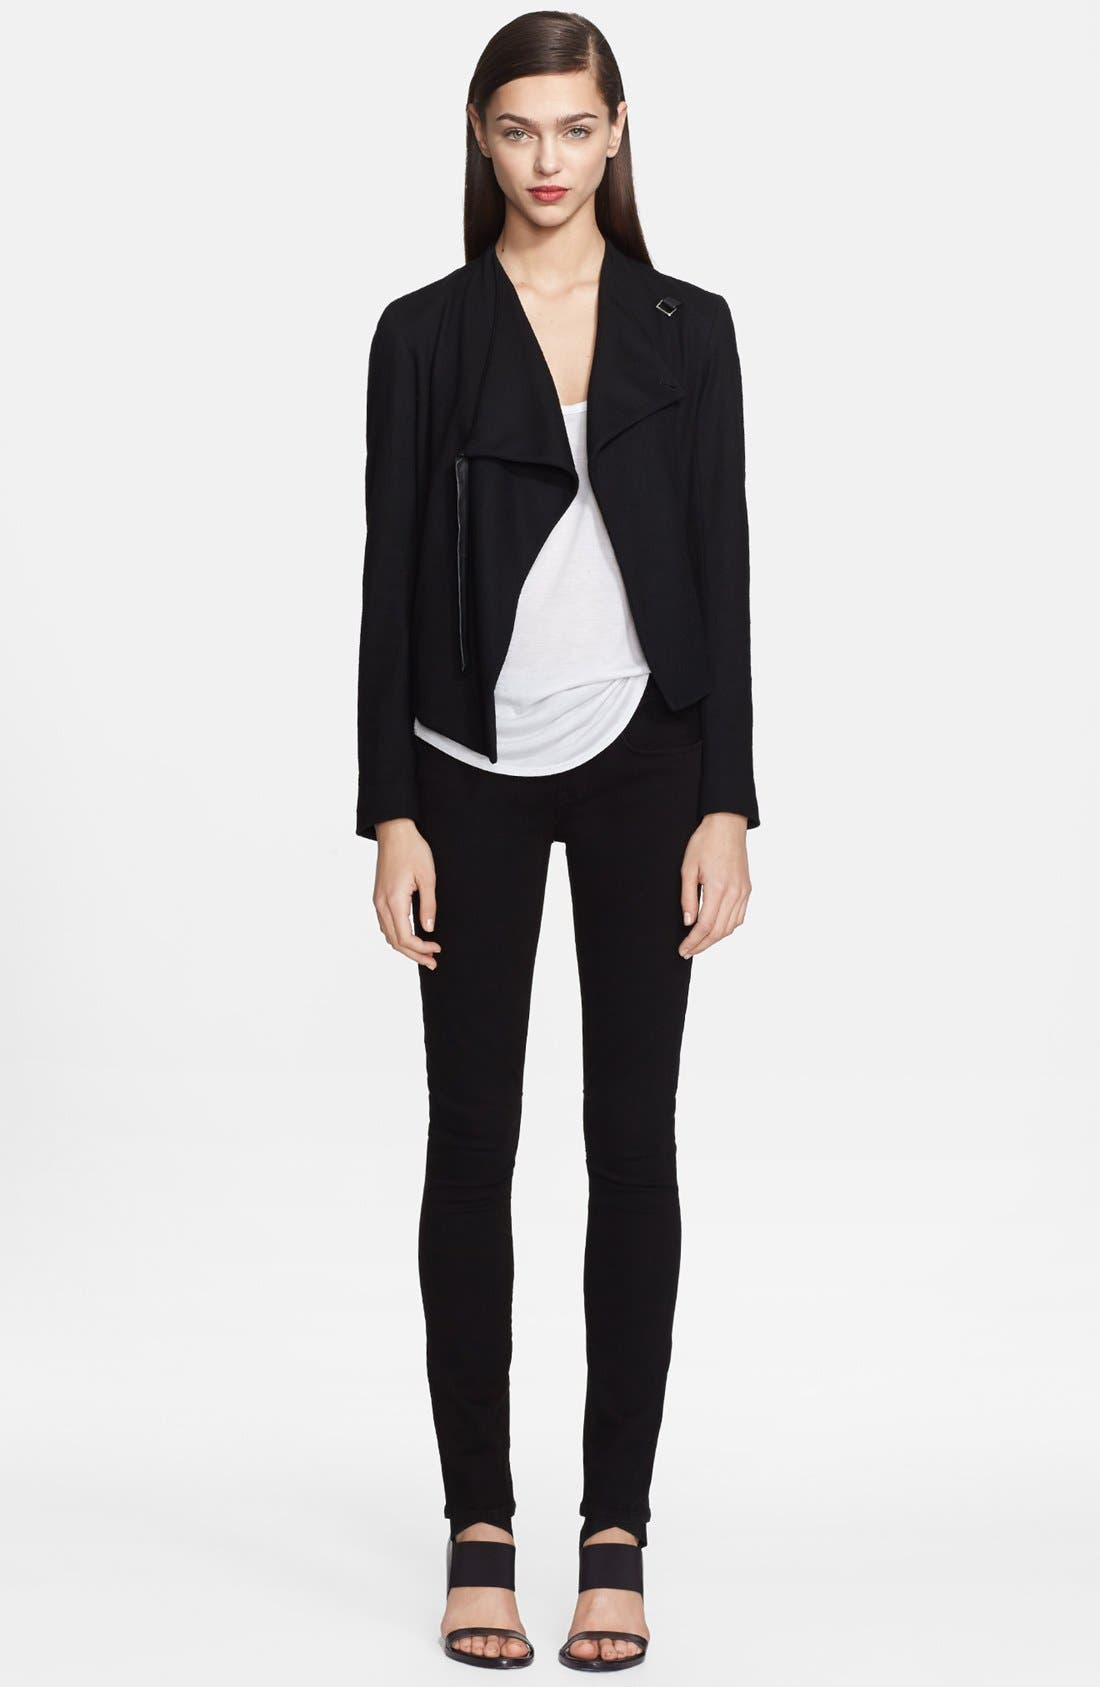 Alternate Image 1 Selected - Helmut Lang 'Sonar Wool' Drape Front Jacket